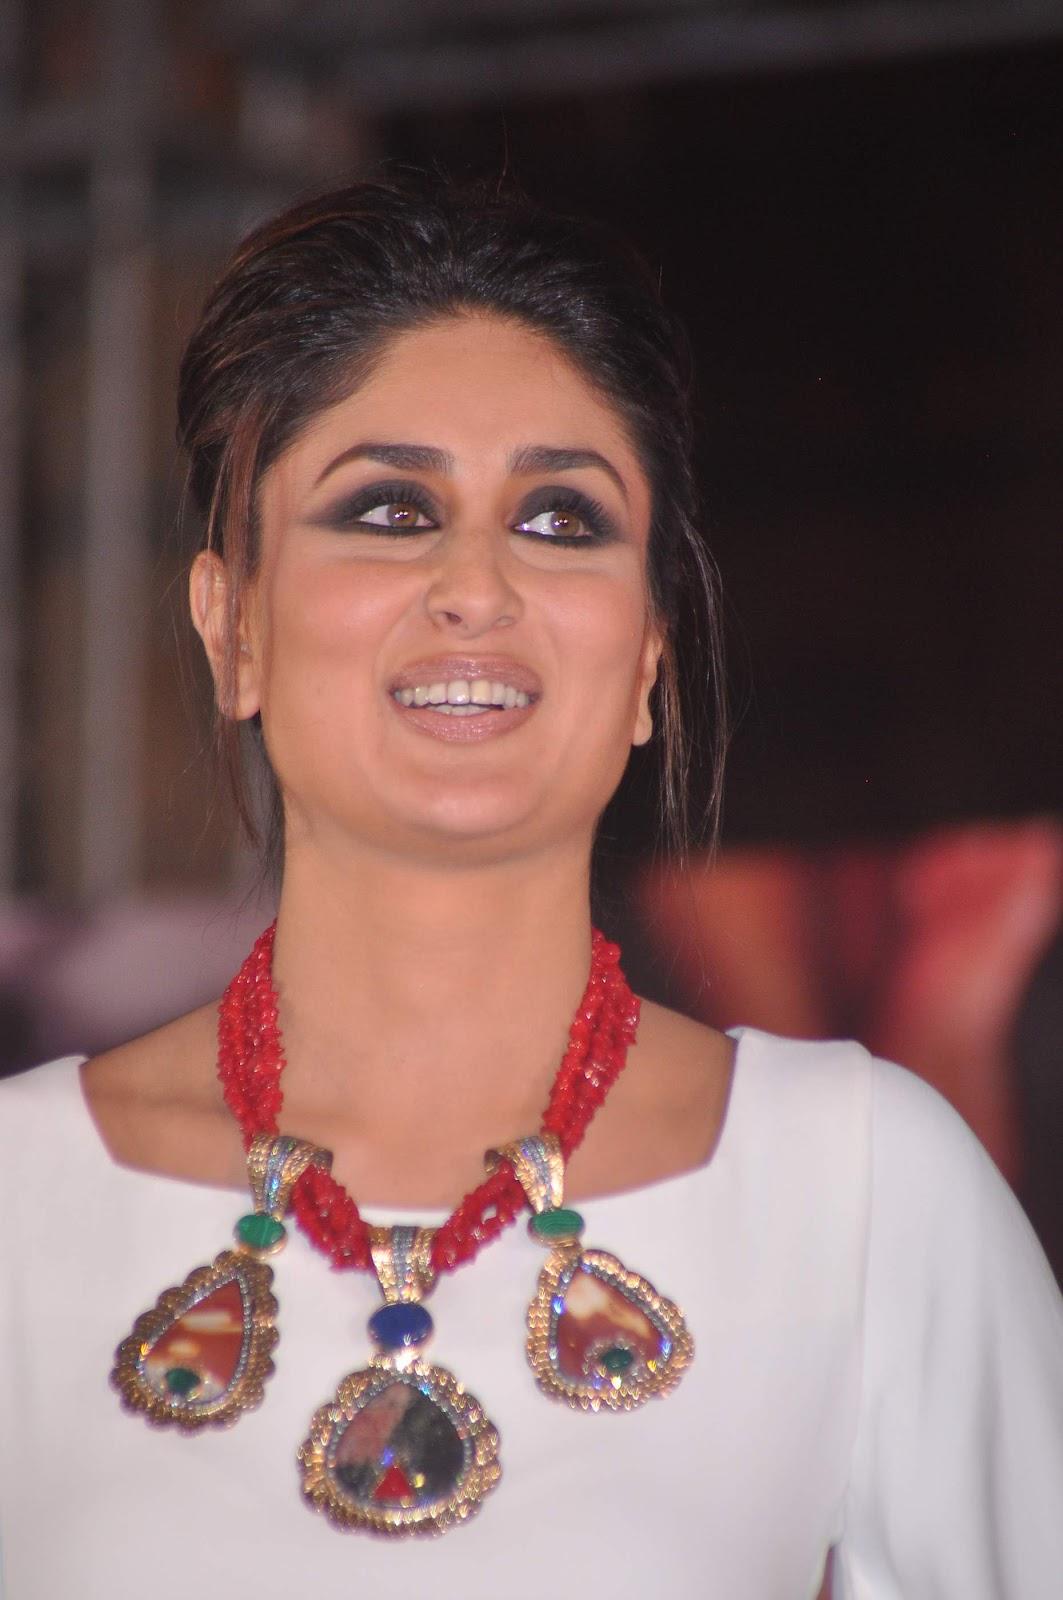 Kareena Kapoor Hot At The Launch of Jealous 21 Heroine Inspired ...